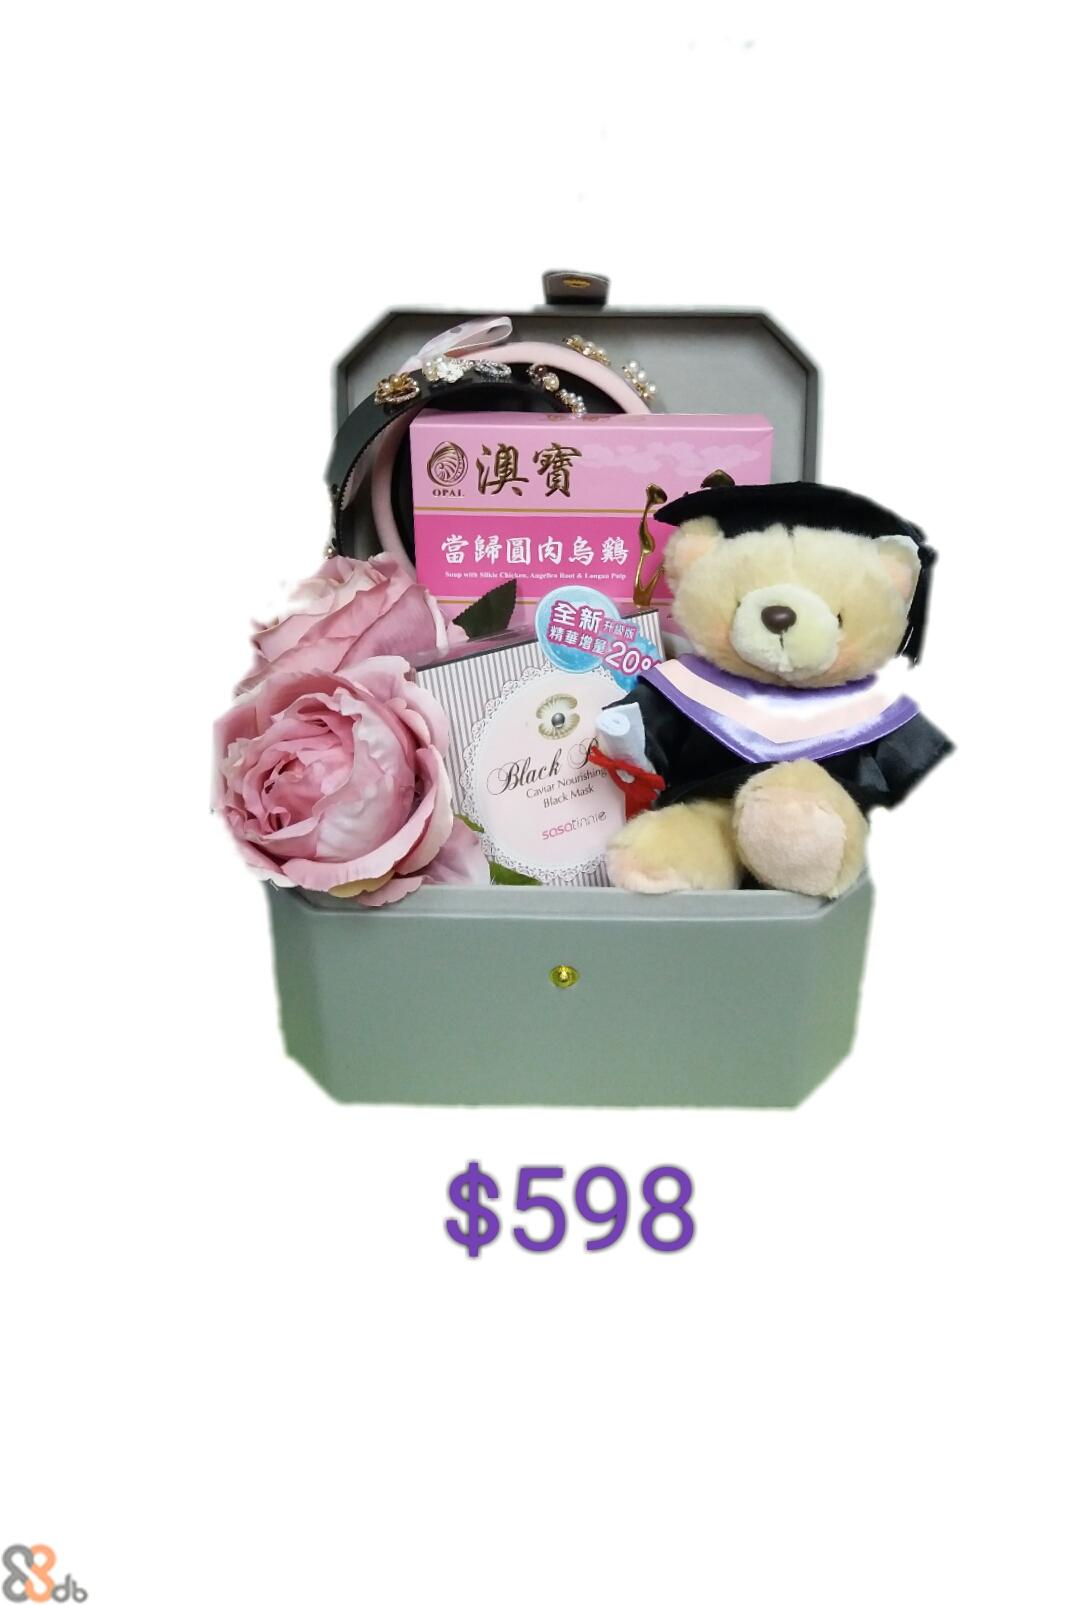 澳寶 當歸圓肉烏鷄 至新 Alack glac tinnie $598  product,gift,product,hamper,toy